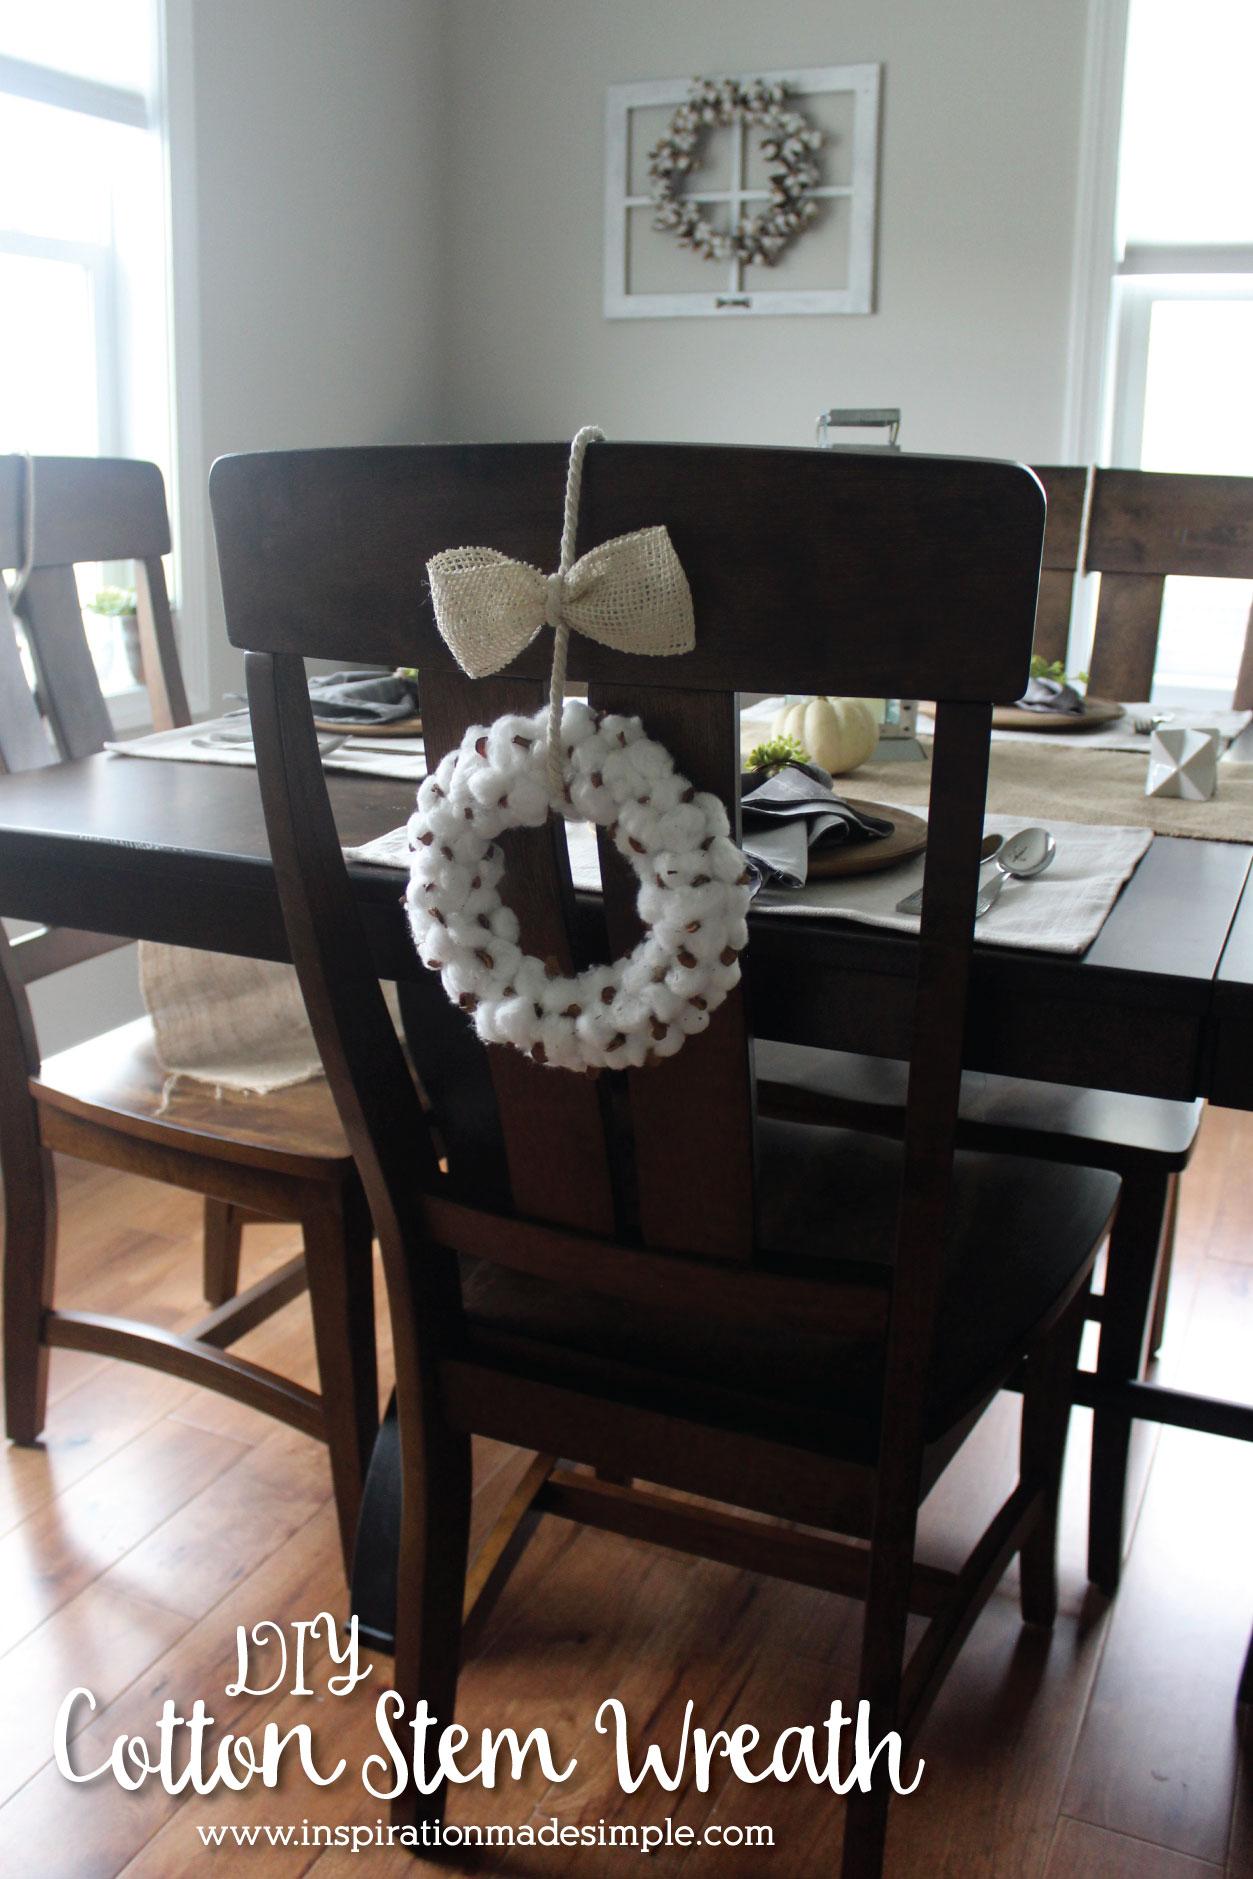 DIY Cotton Stem Wreath Tutorial